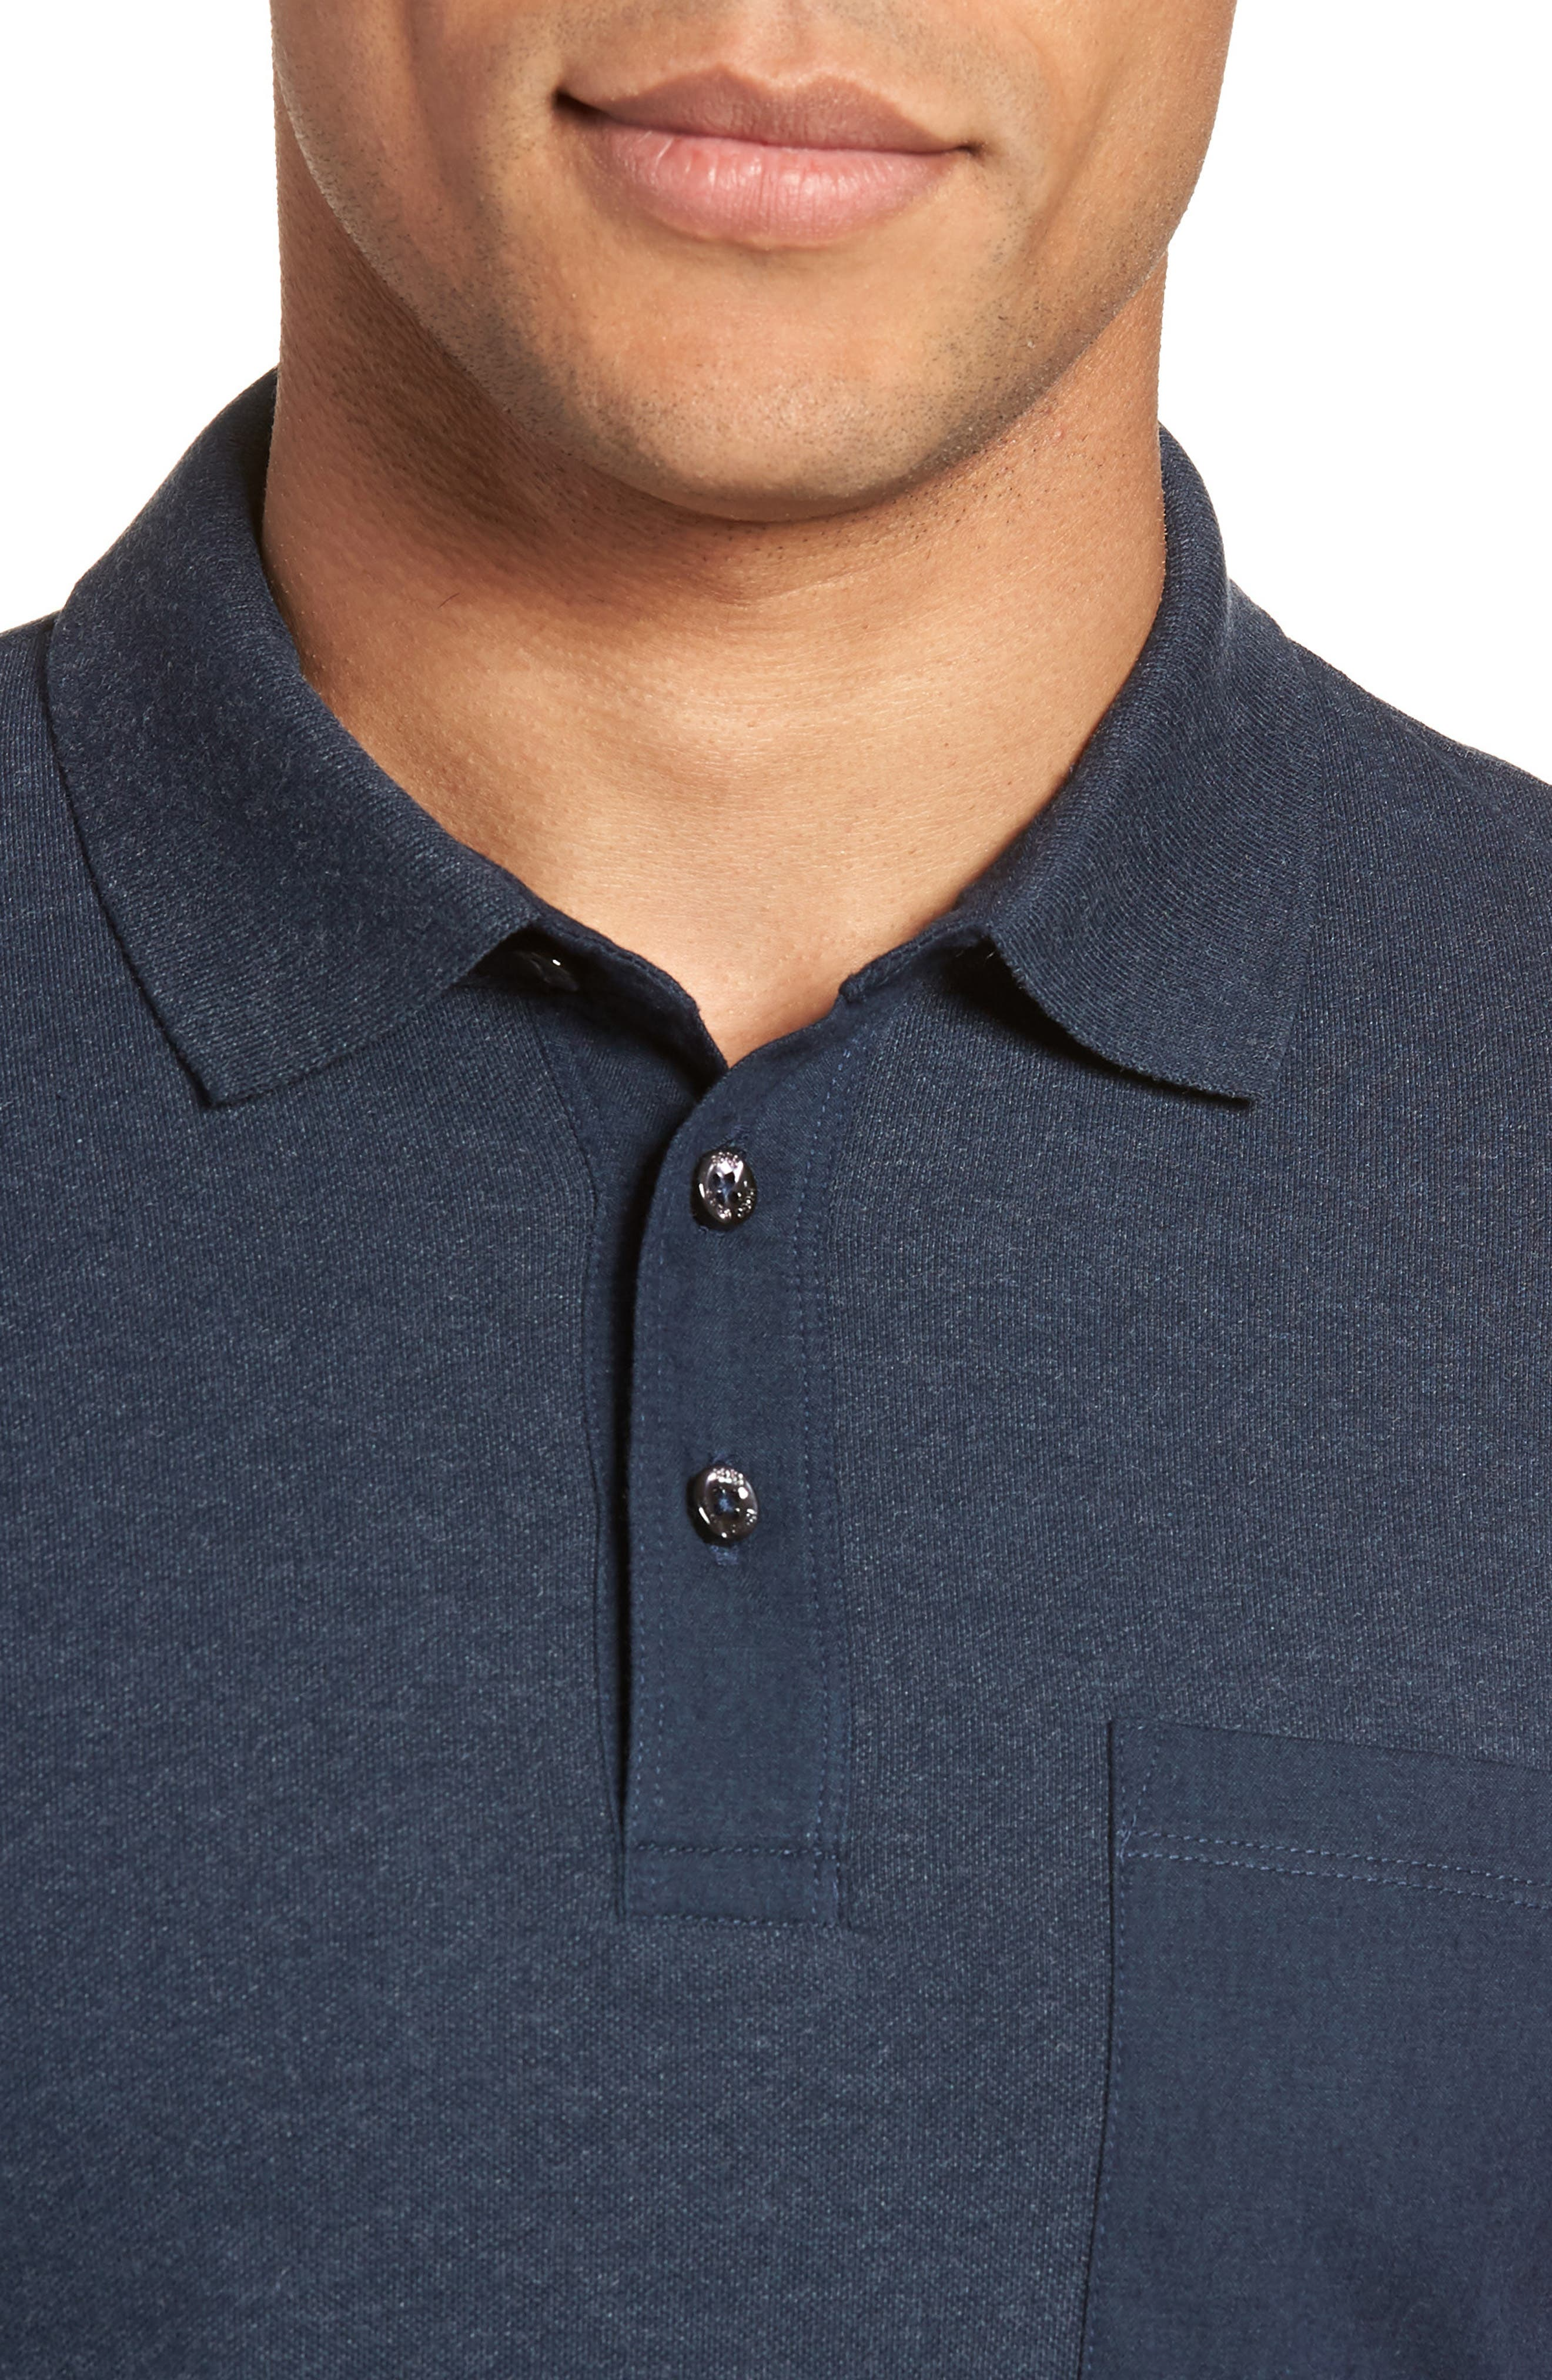 Penrose Polo Shirt,                             Alternate thumbnail 4, color,                             Blue